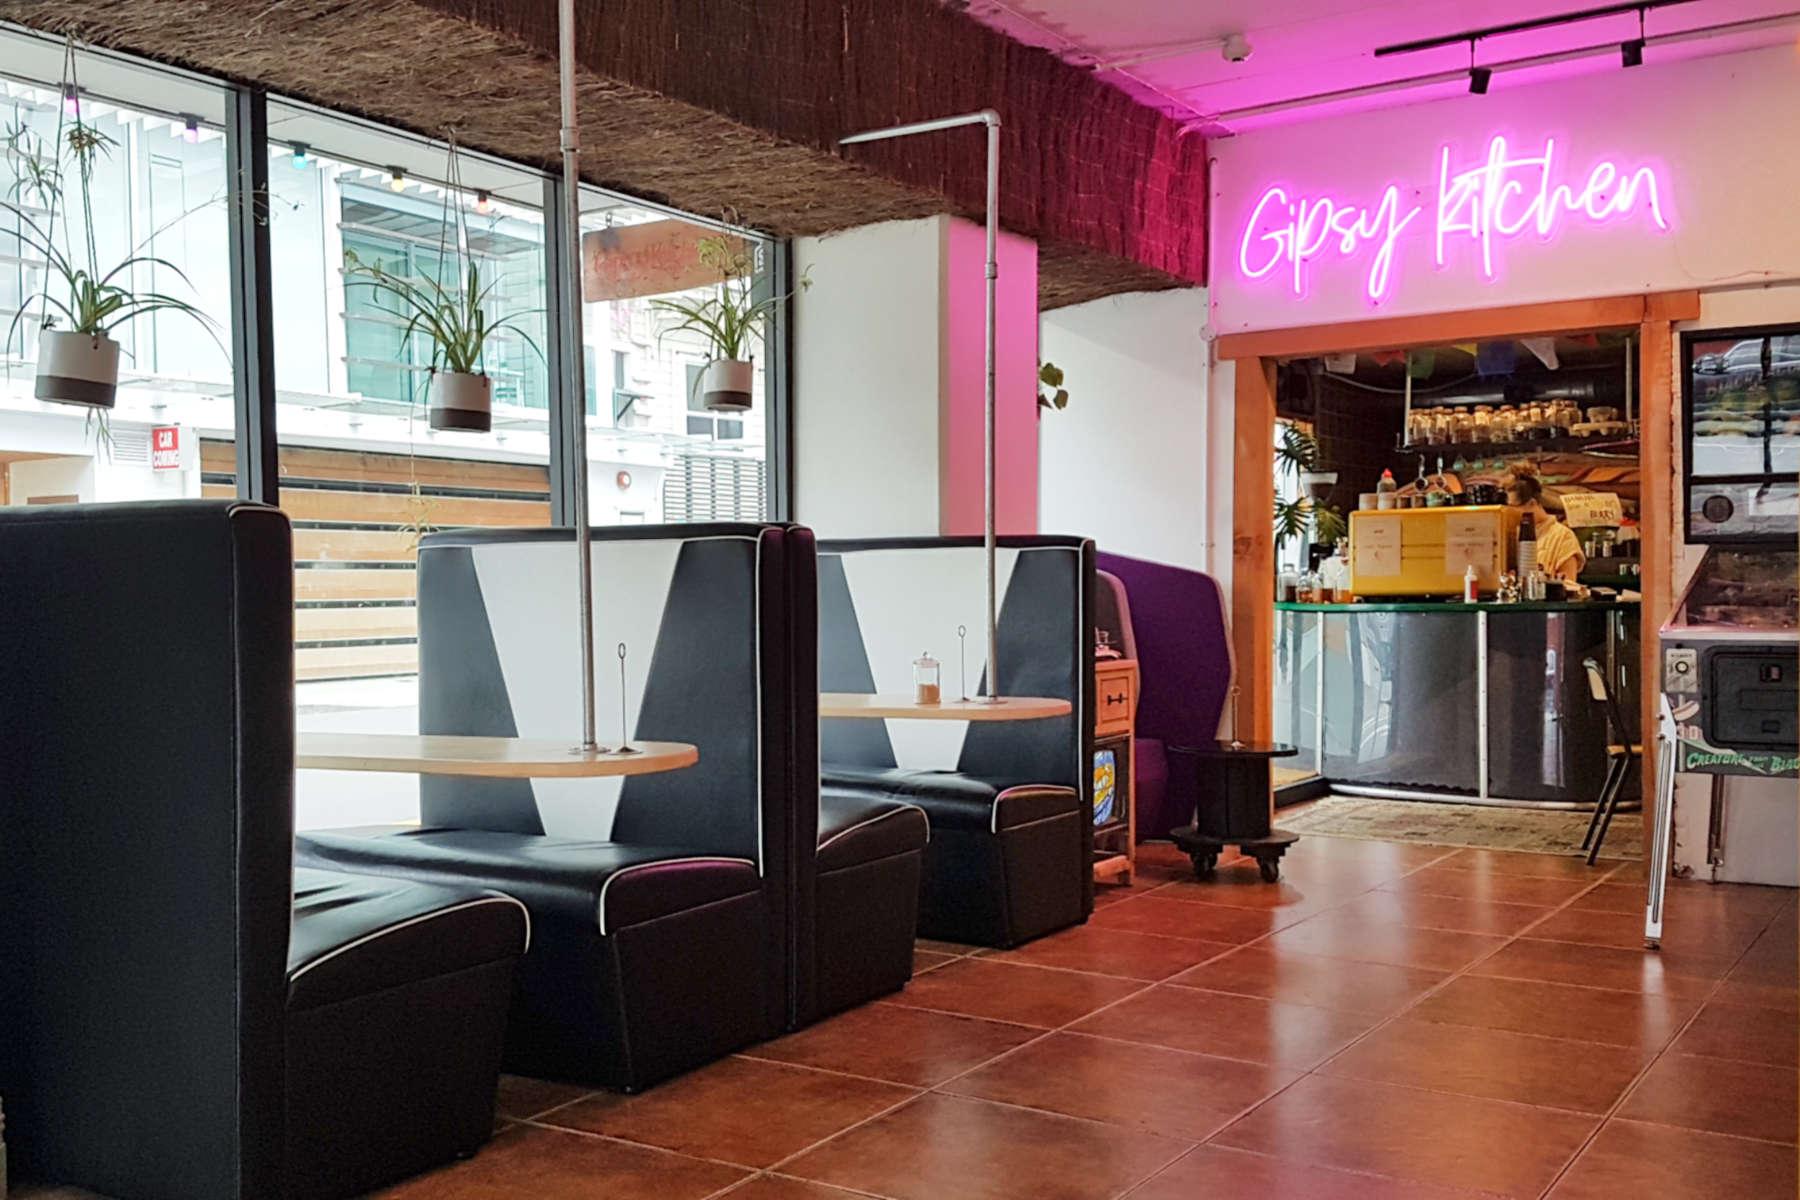 Gypsy Kitchen interior - black diner seating